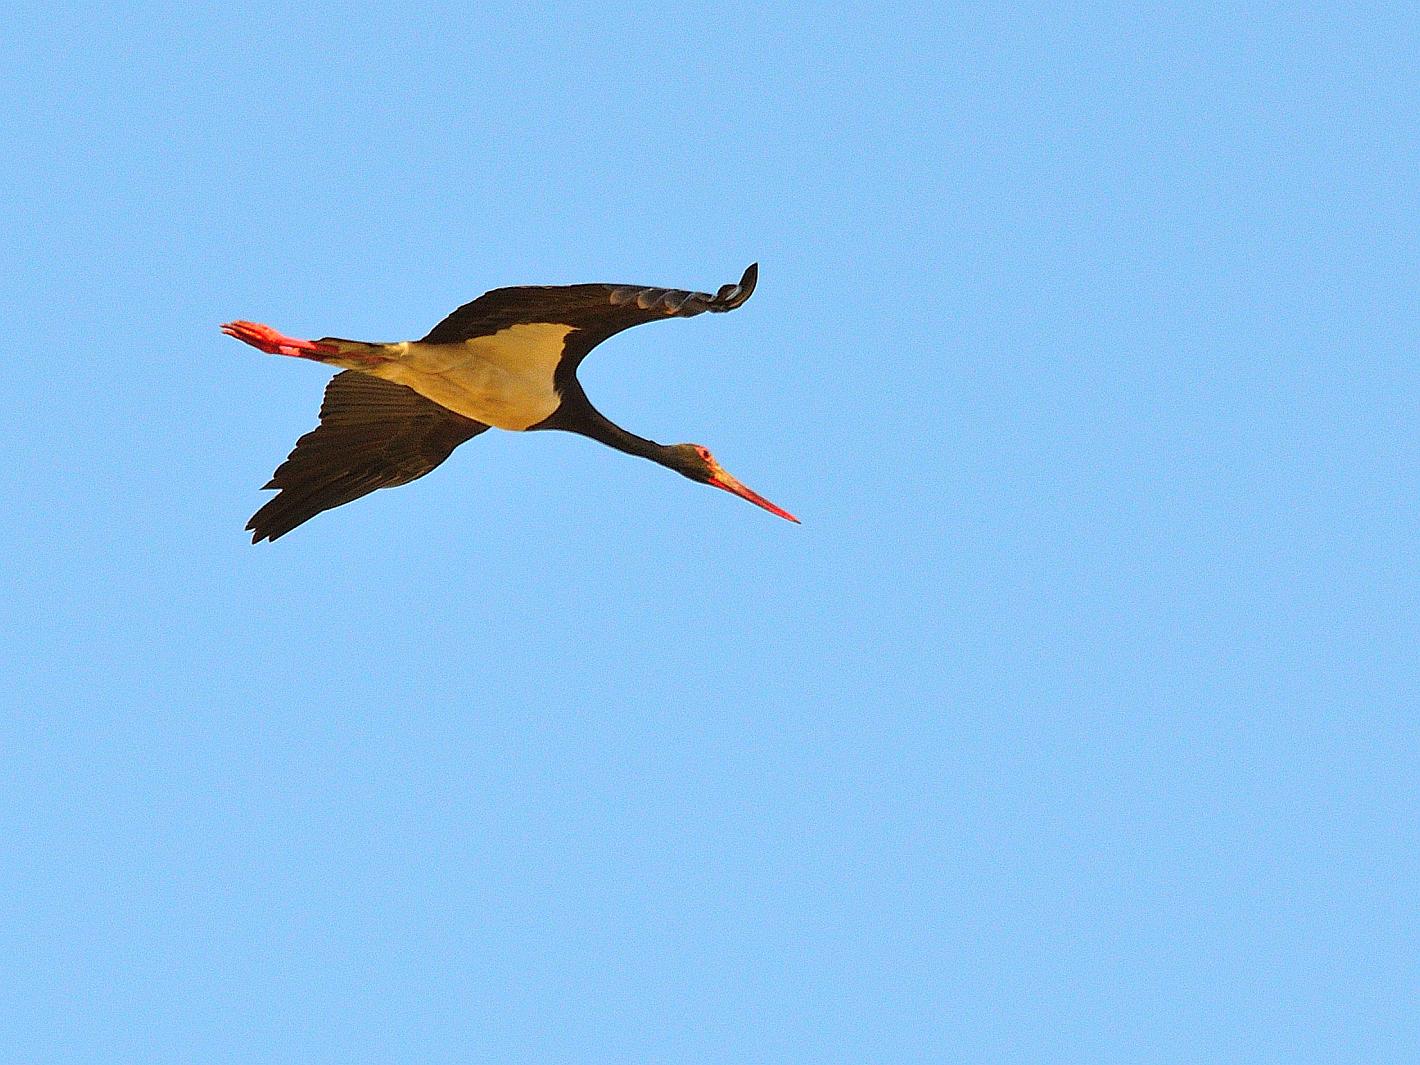 Seltener Vogel, rare bird, ave rara